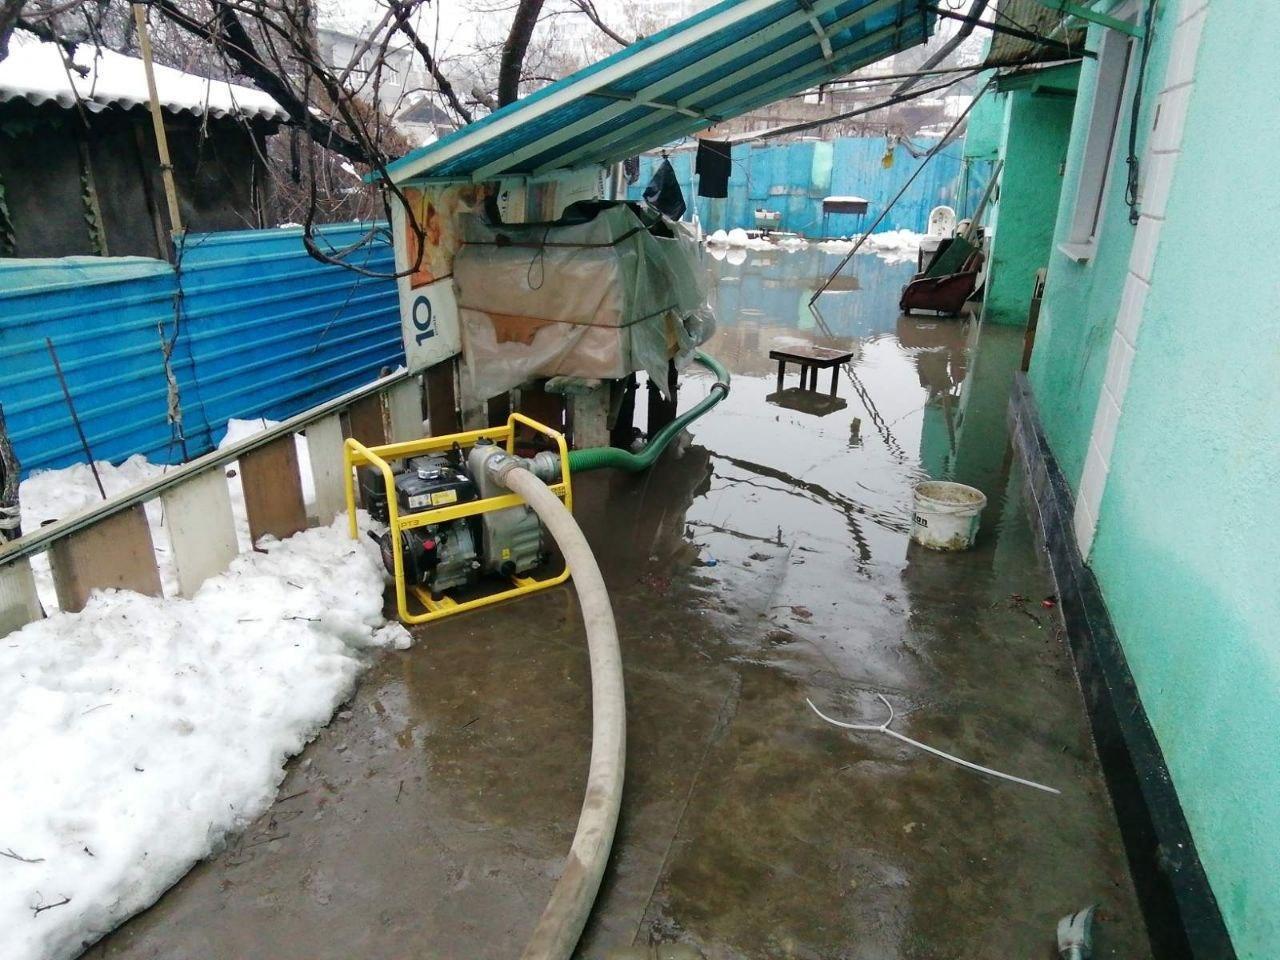 В Одессе дом из-за дождя и снега частично ушёл под воду, - ФОТО, фото-4